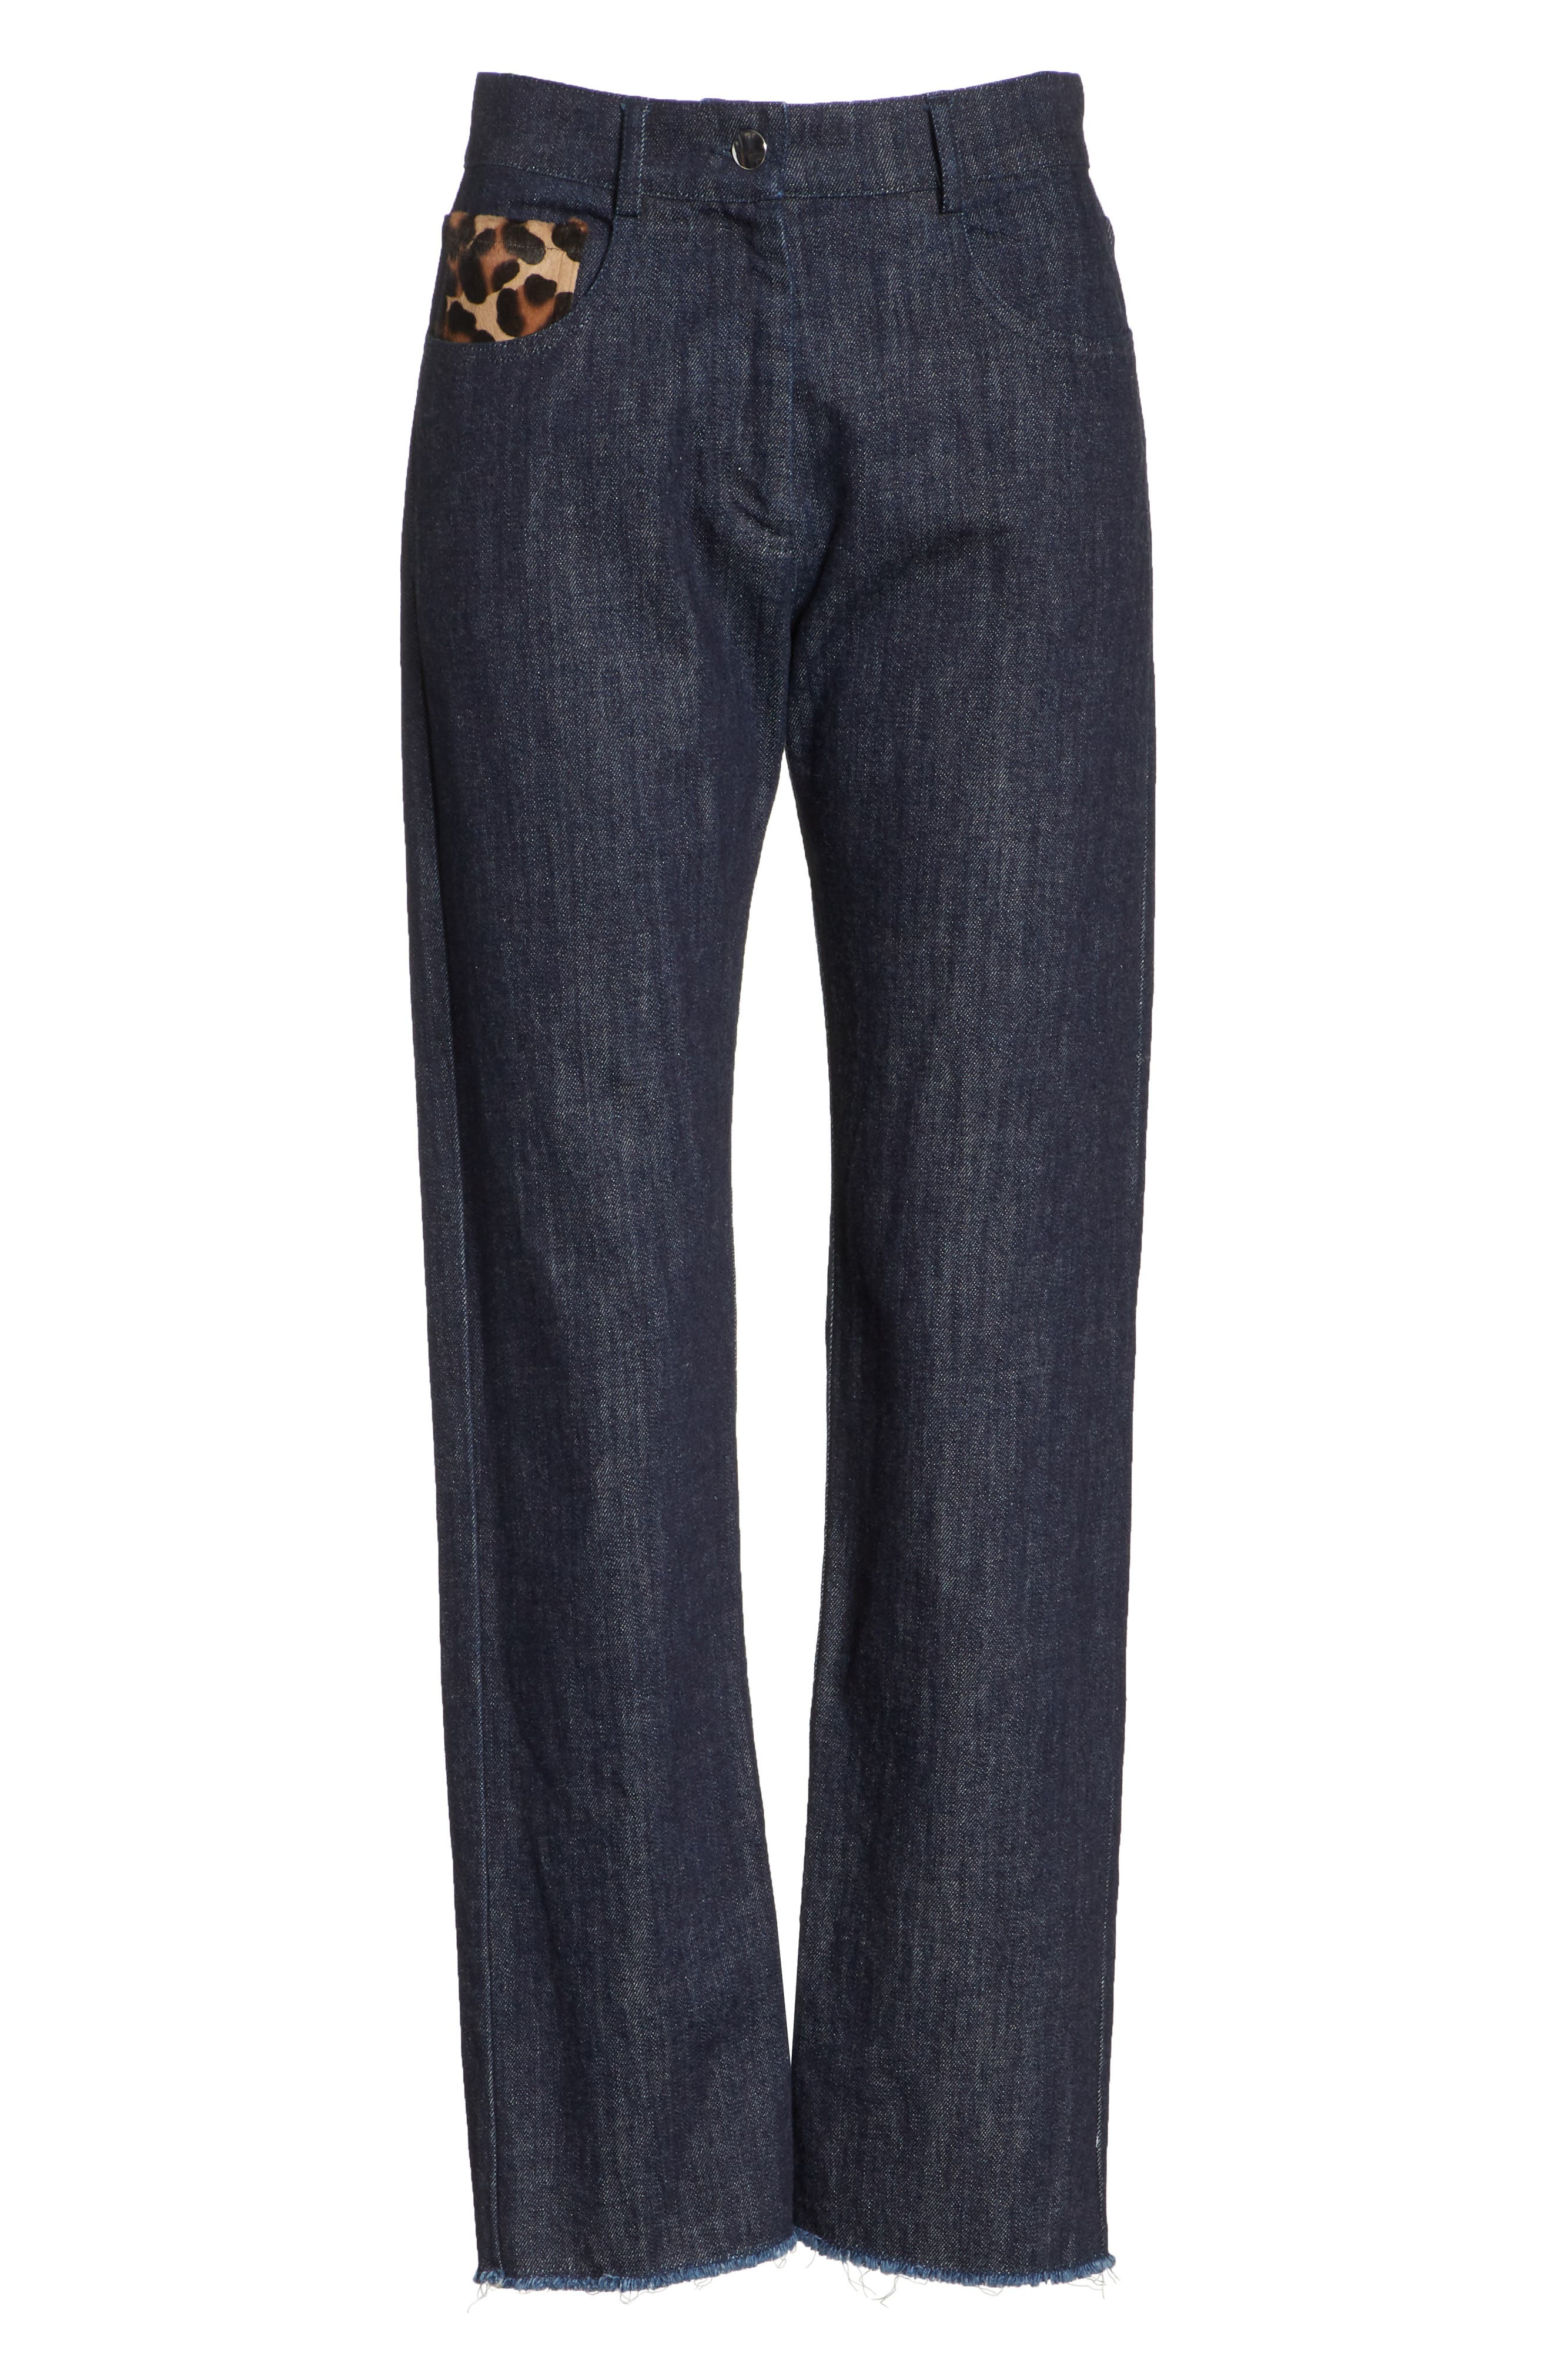 Genuine Calf Hair Pocket Straight Leg Jeans,                             Alternate thumbnail 6, color,                             INDIGO